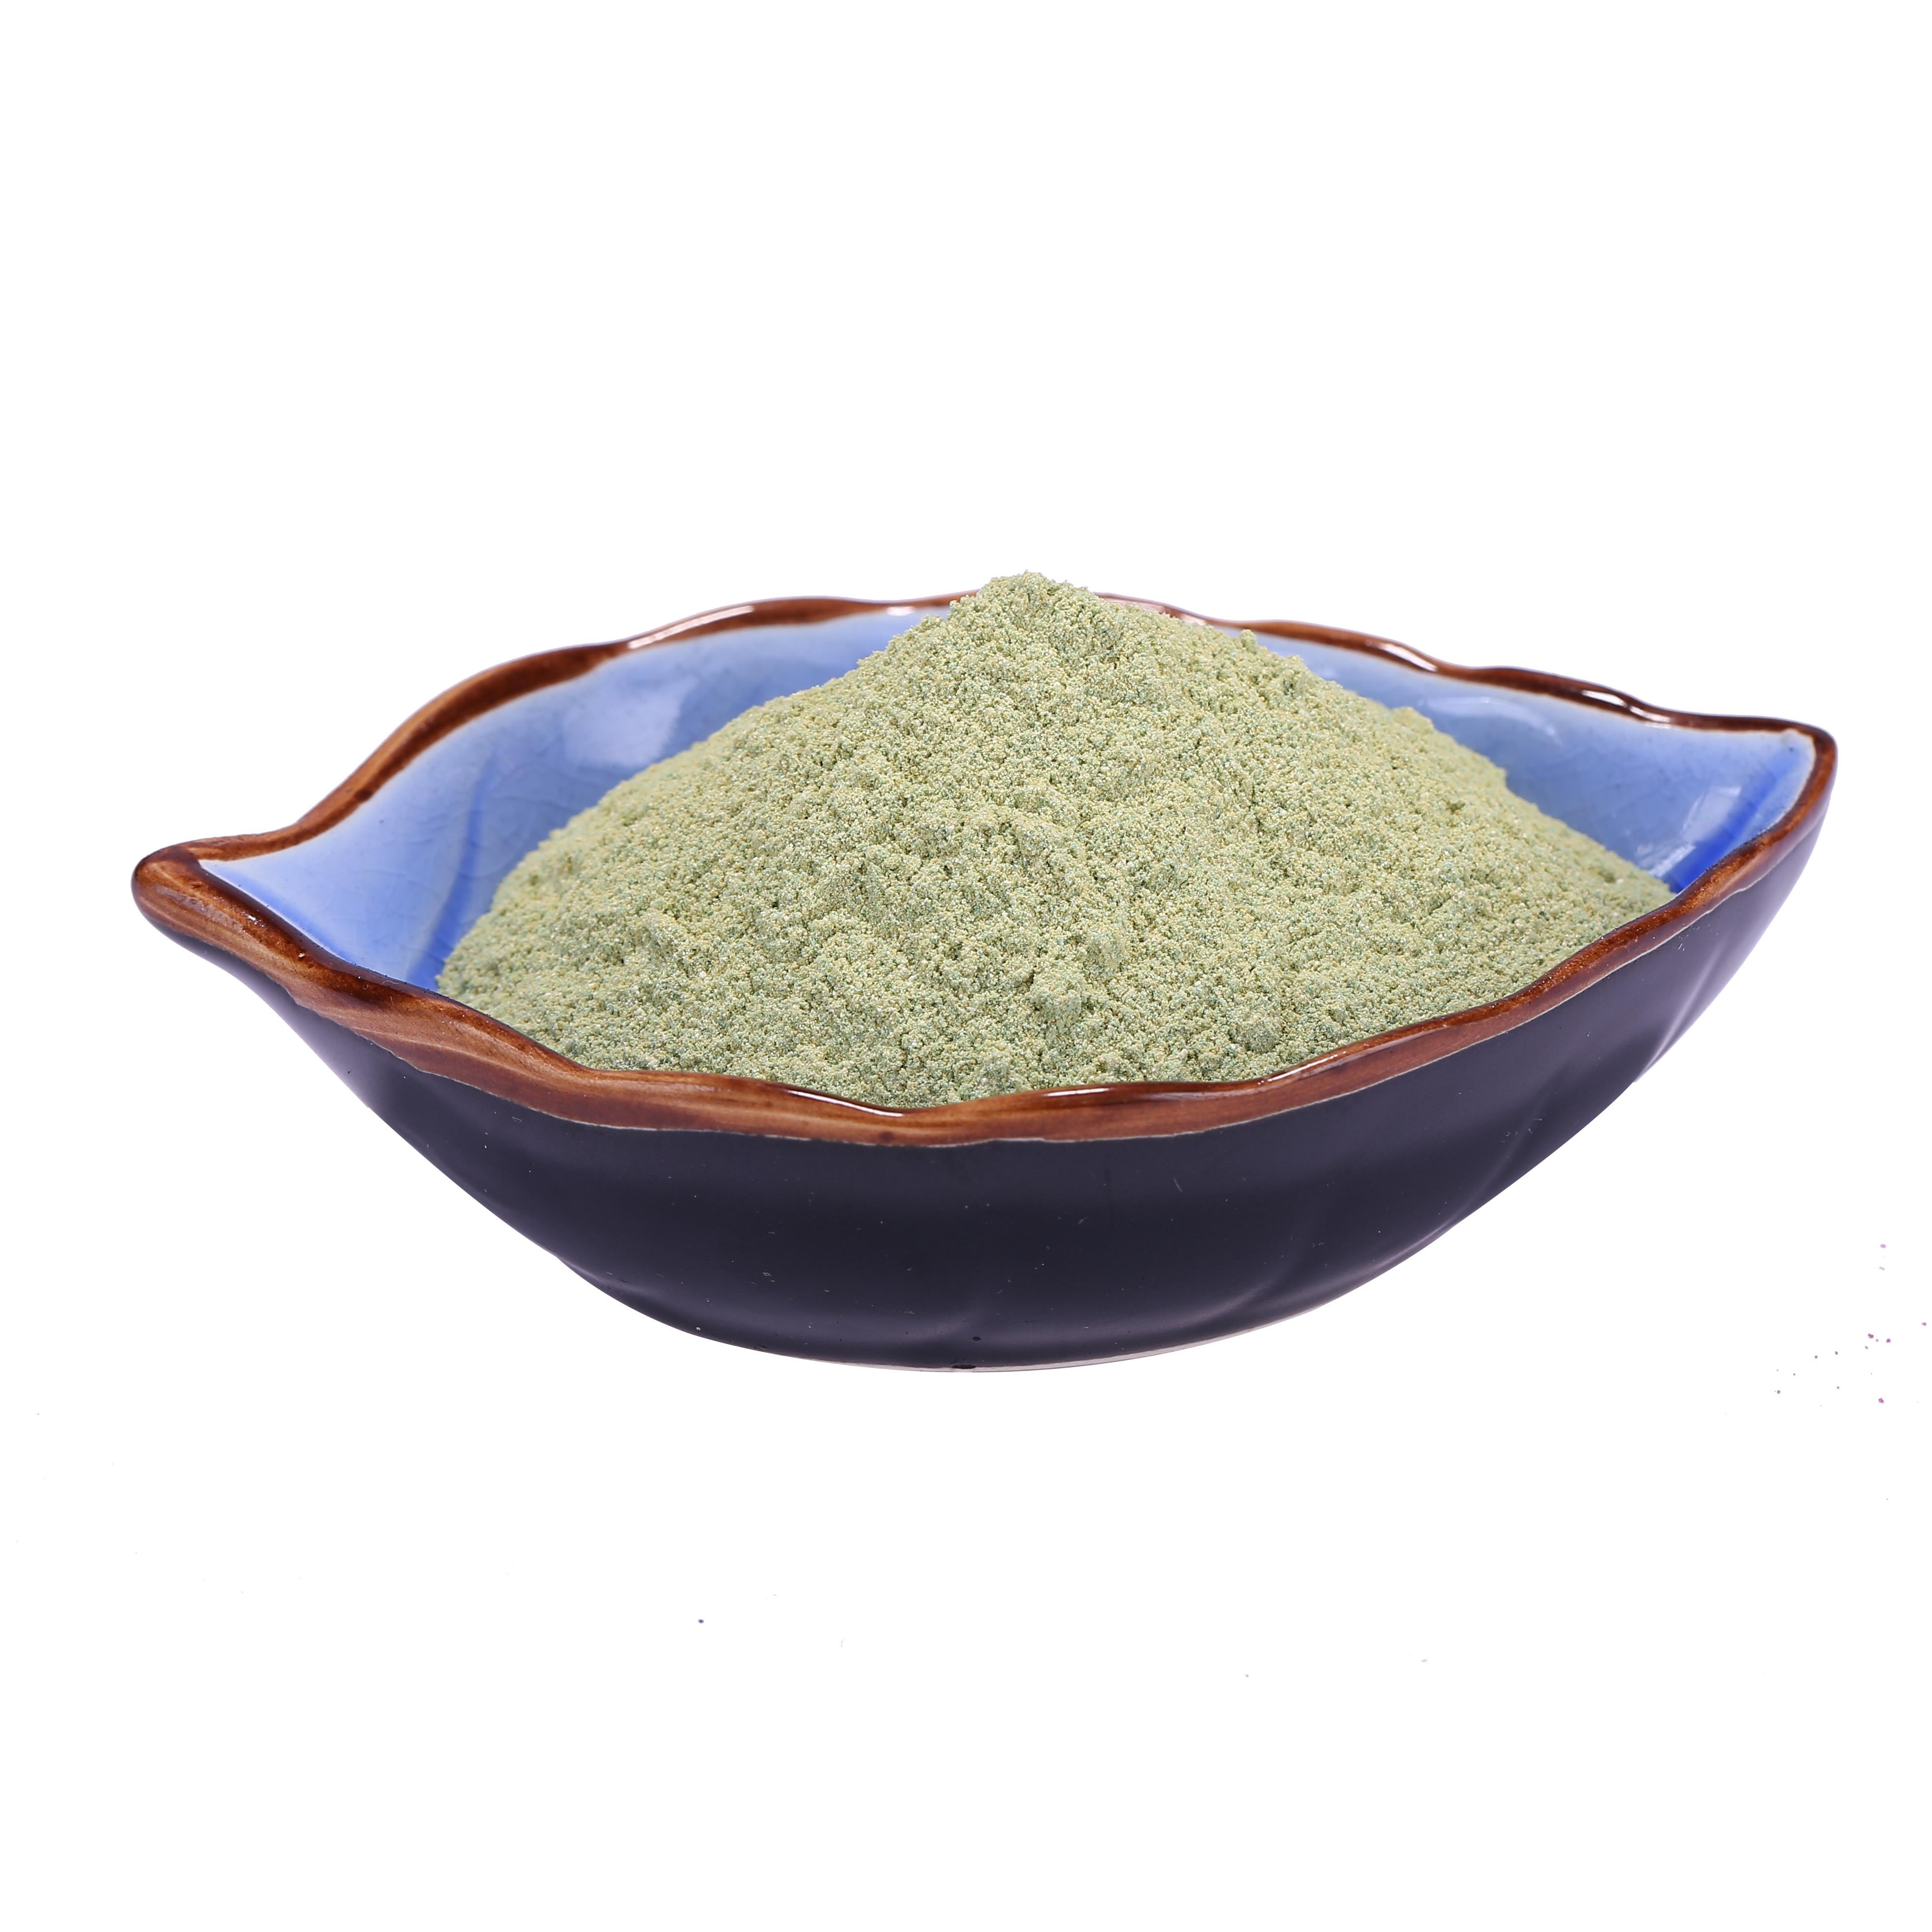 Nutritional supplements chelated tetrasodium fertilizer powder edta mix01